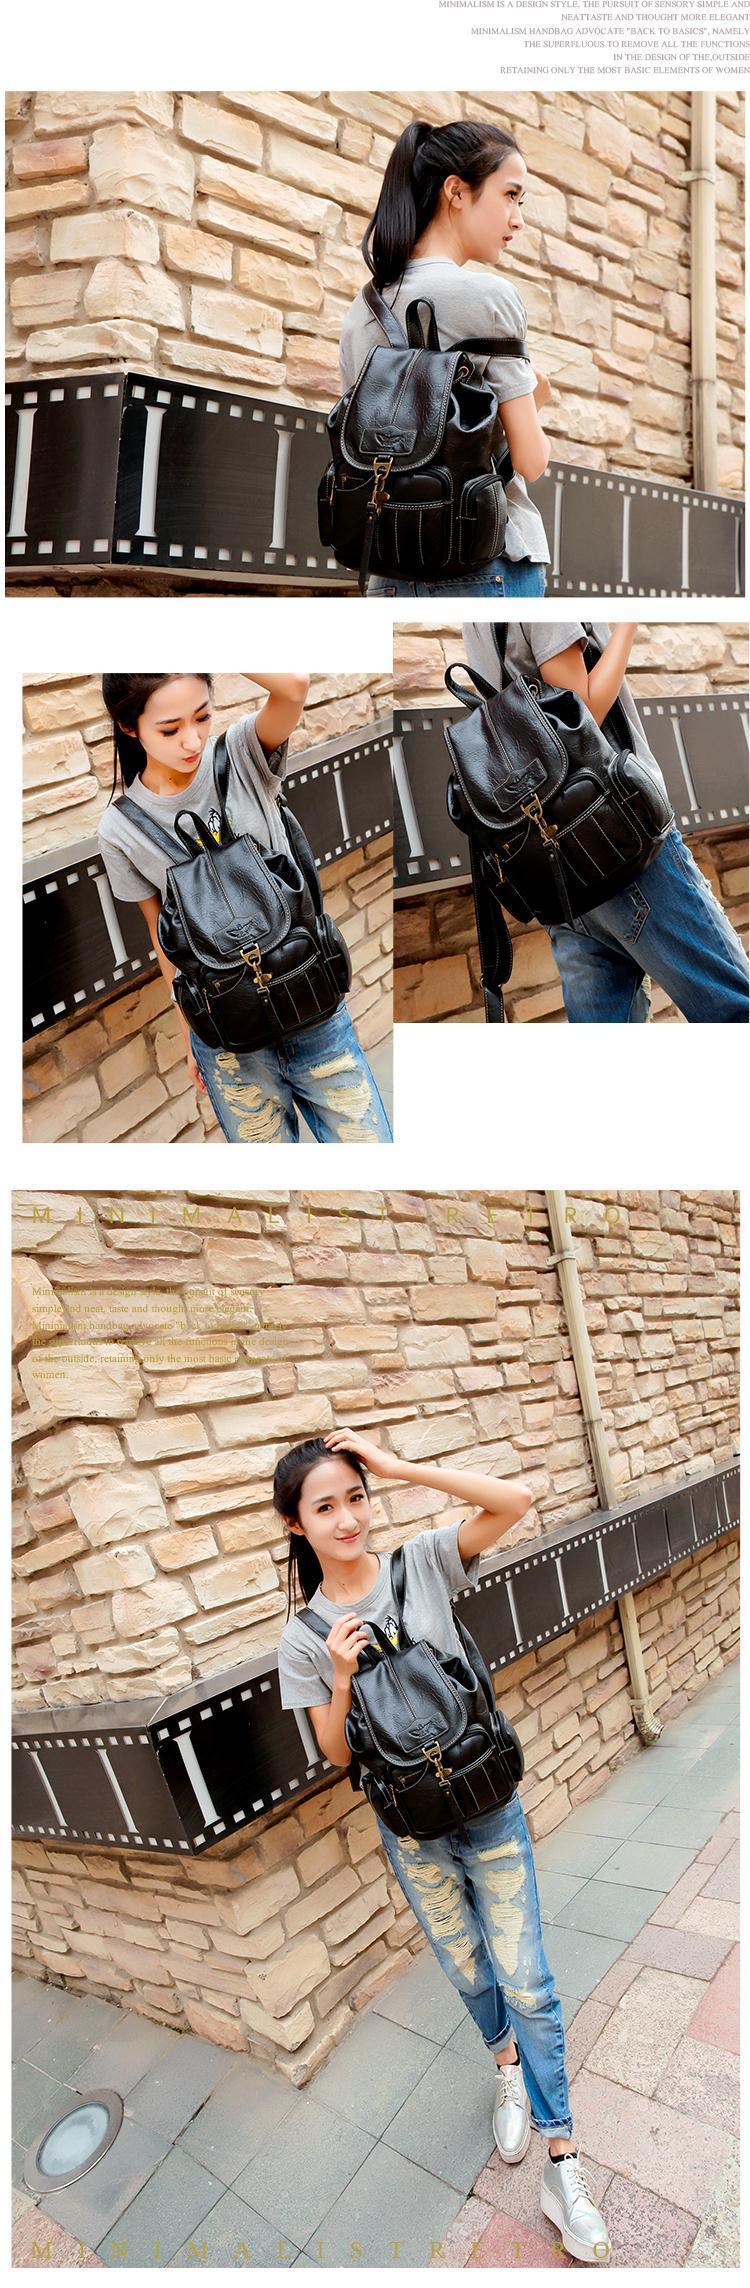 HTB1CM .yuGSBuNjSspbq6AiipXao High Quality Women Backpack Vintage Backpacks For Teenage Girls Fashion Large School Bags PU Leather Black Mochila Feminina